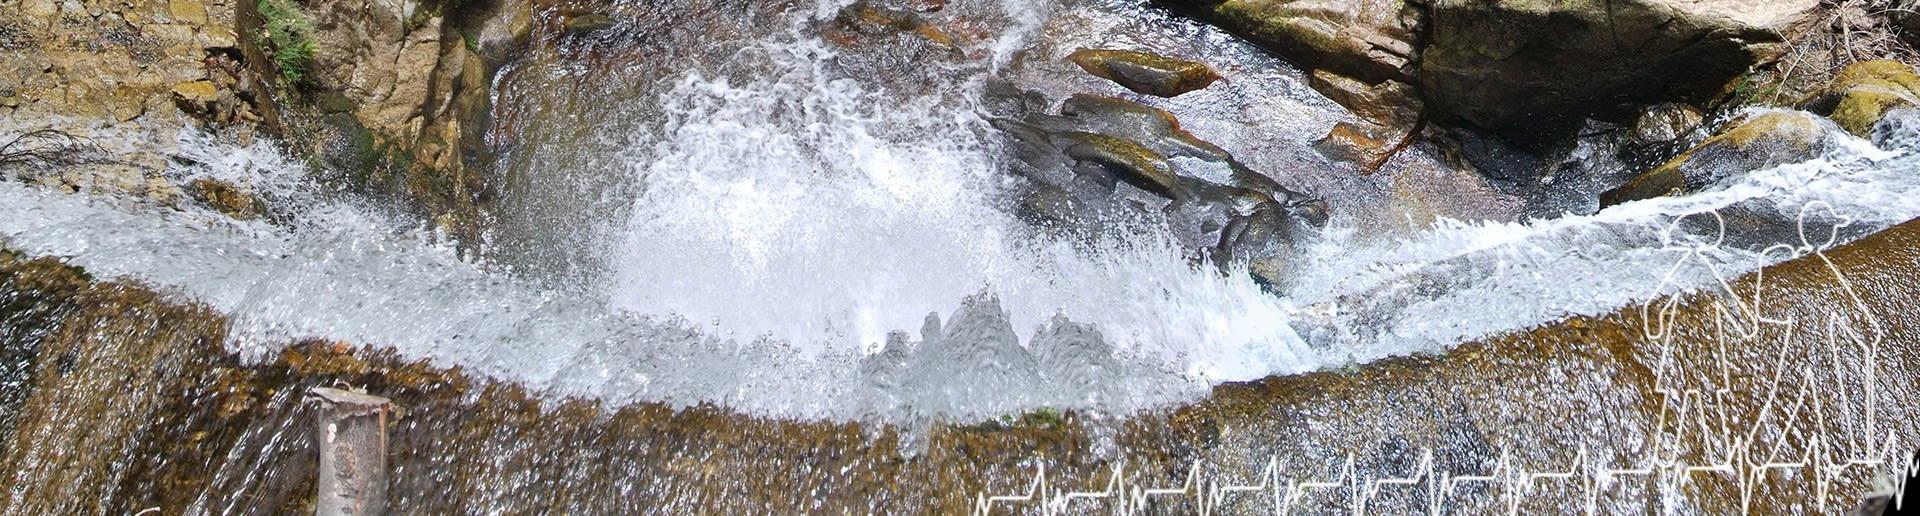 Ferdinandea (Stilo); Diga Azzarella dellimpianto idroelettrico del Marmarico